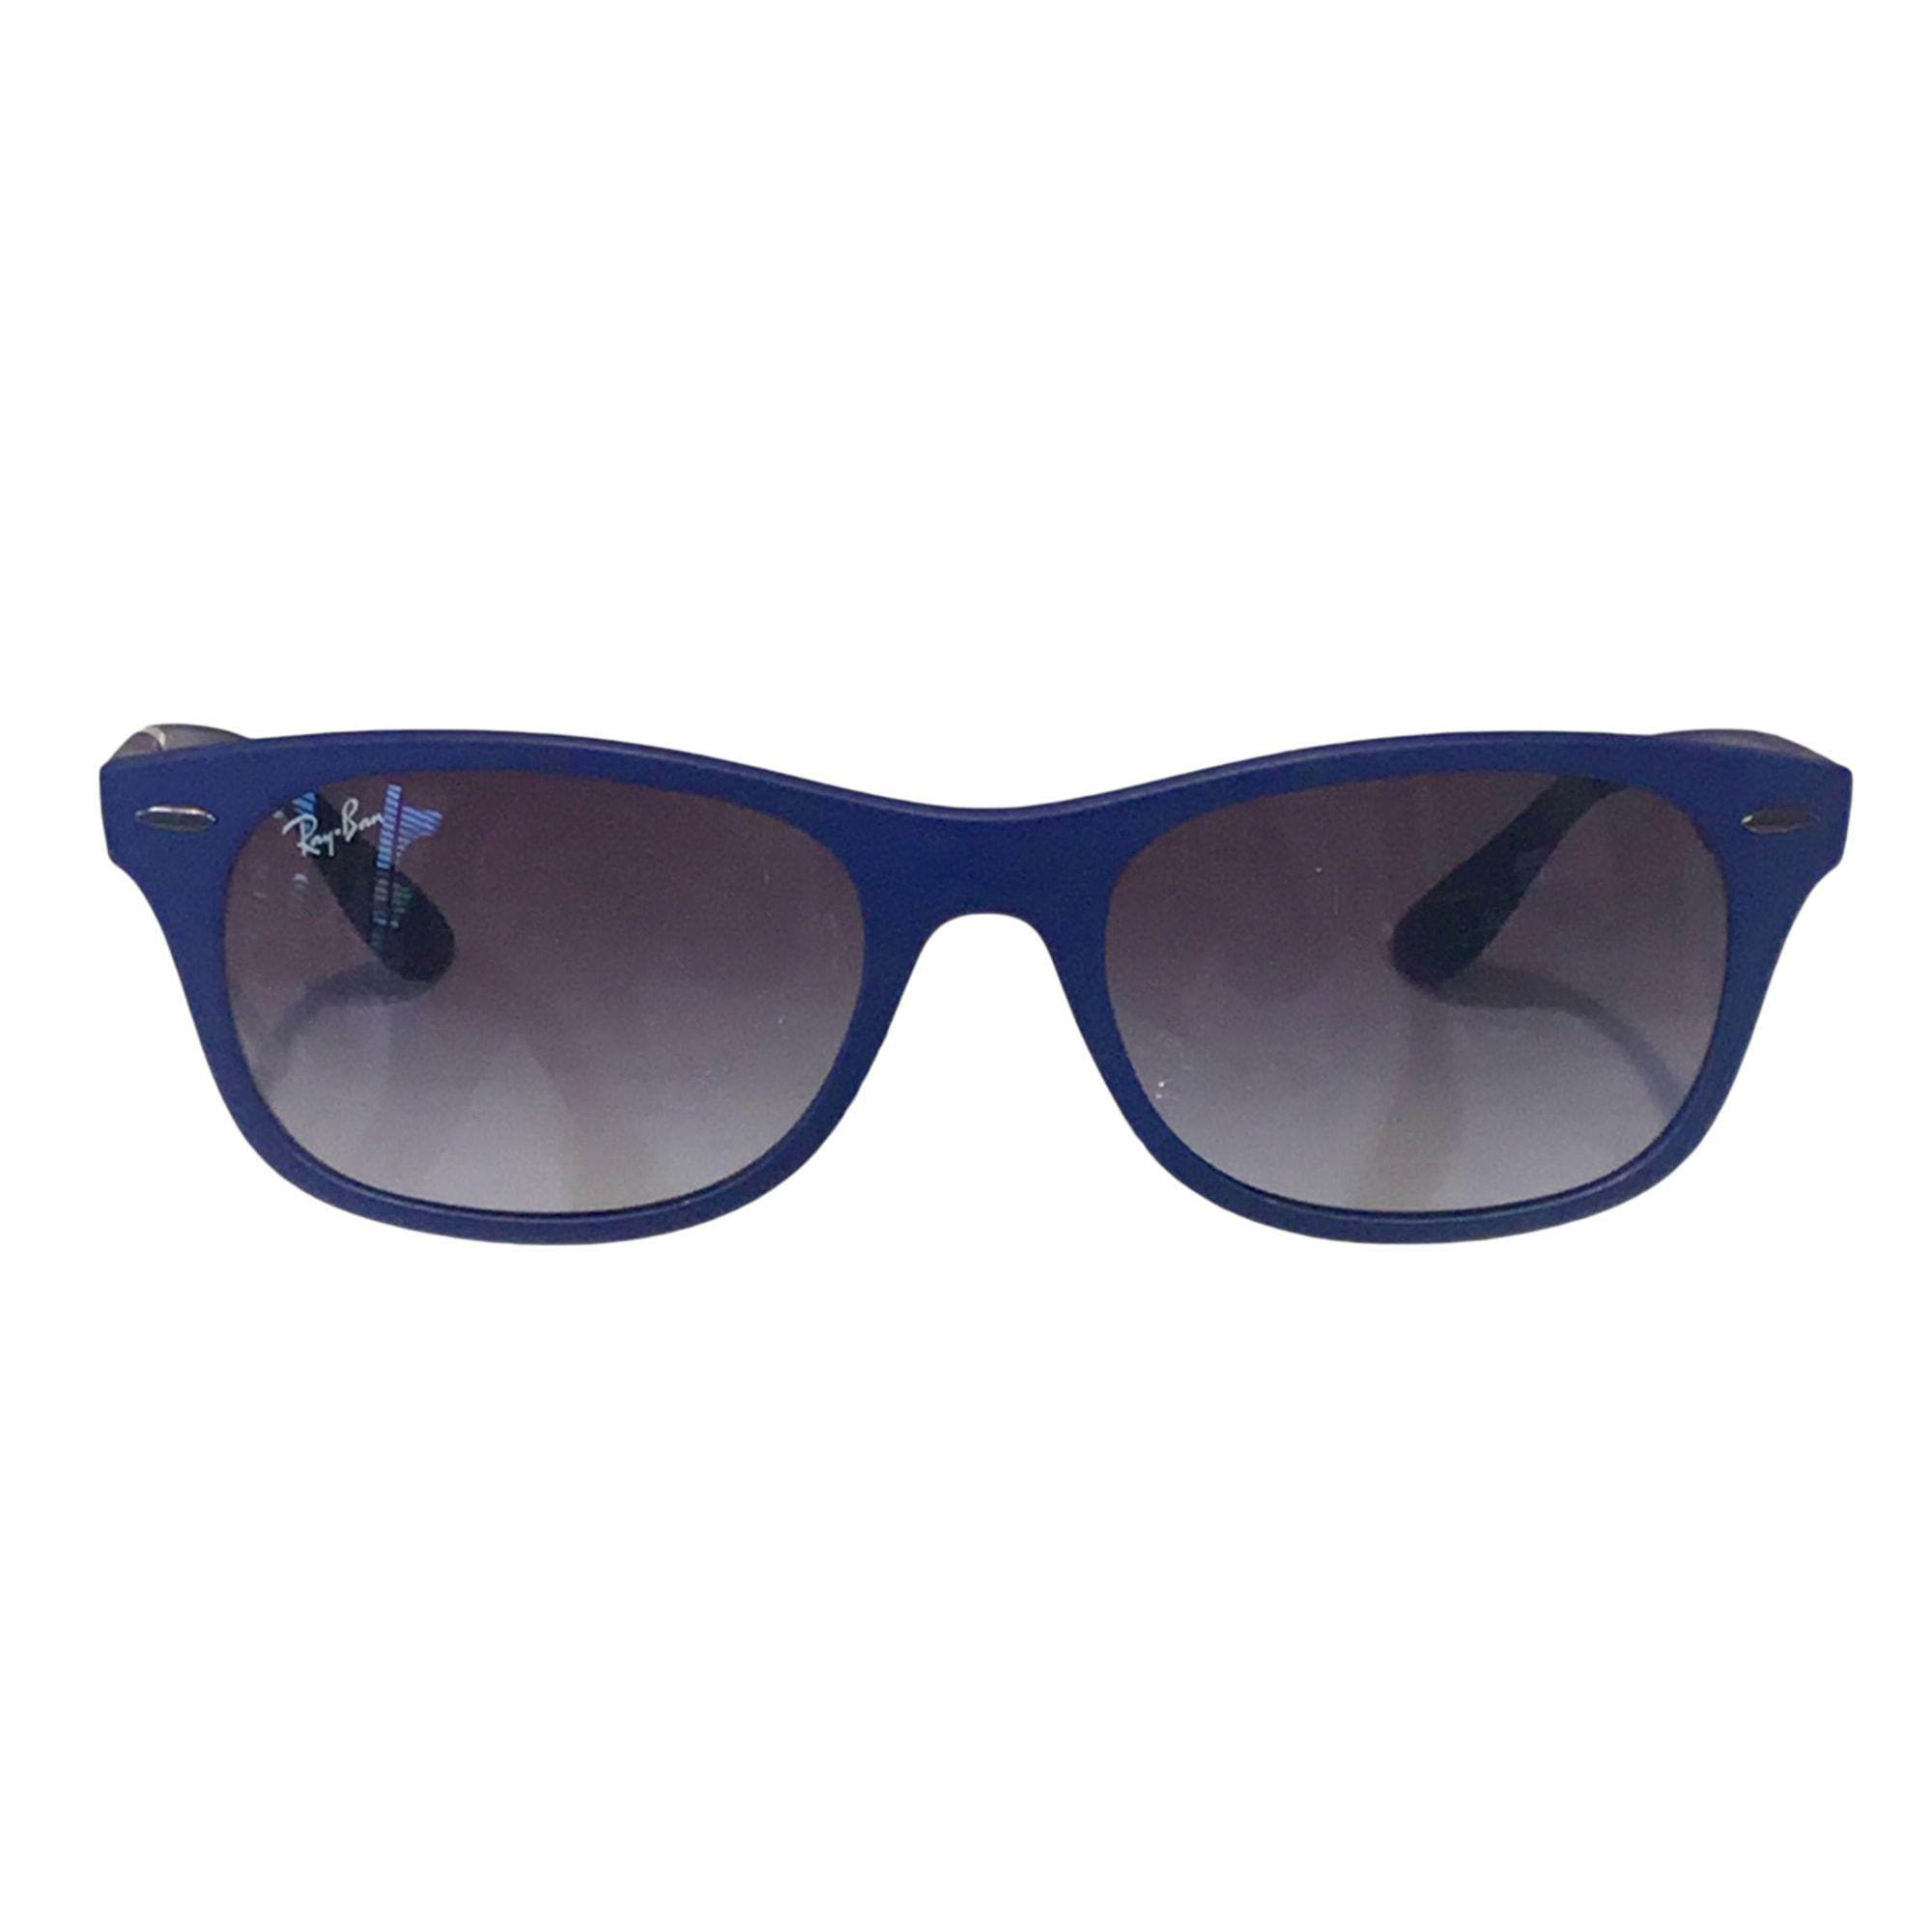 Lunettes de soleil RAY-BAN Bleu, bleu marine, bleu turquoise